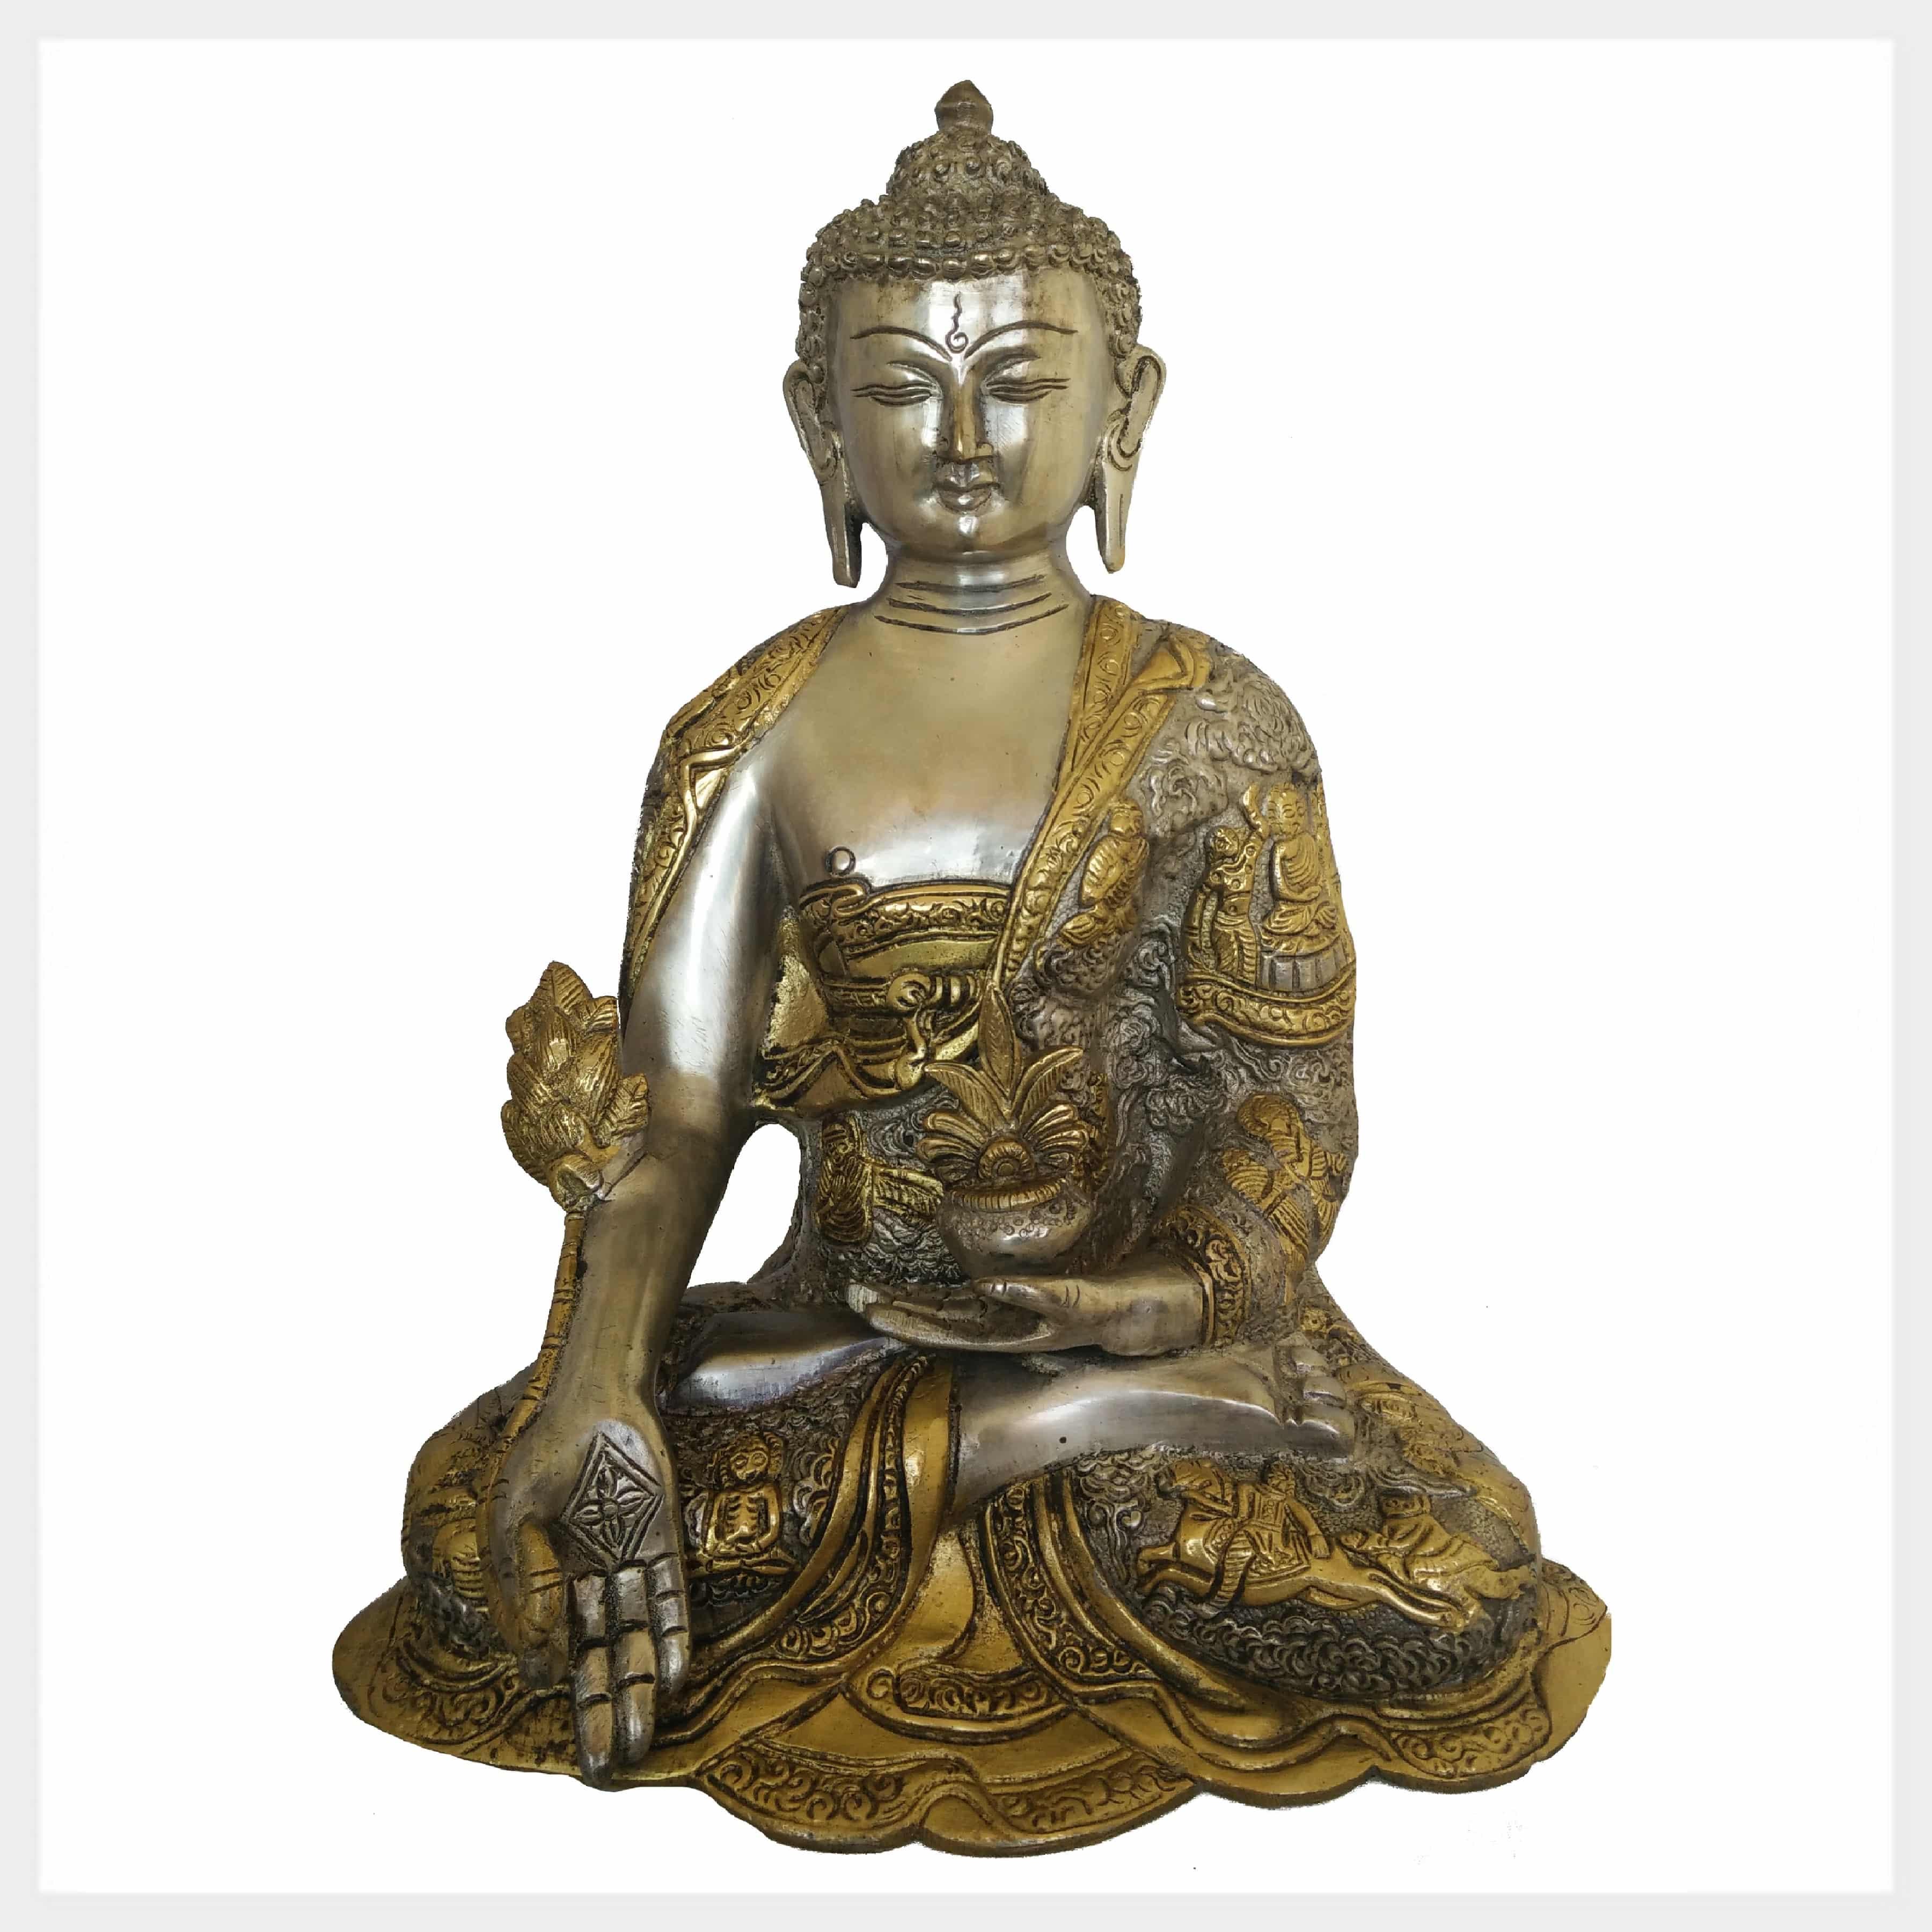 Medizinbuddha Silber Messing 29 Cm Ca 6 Kg Figur Nepal